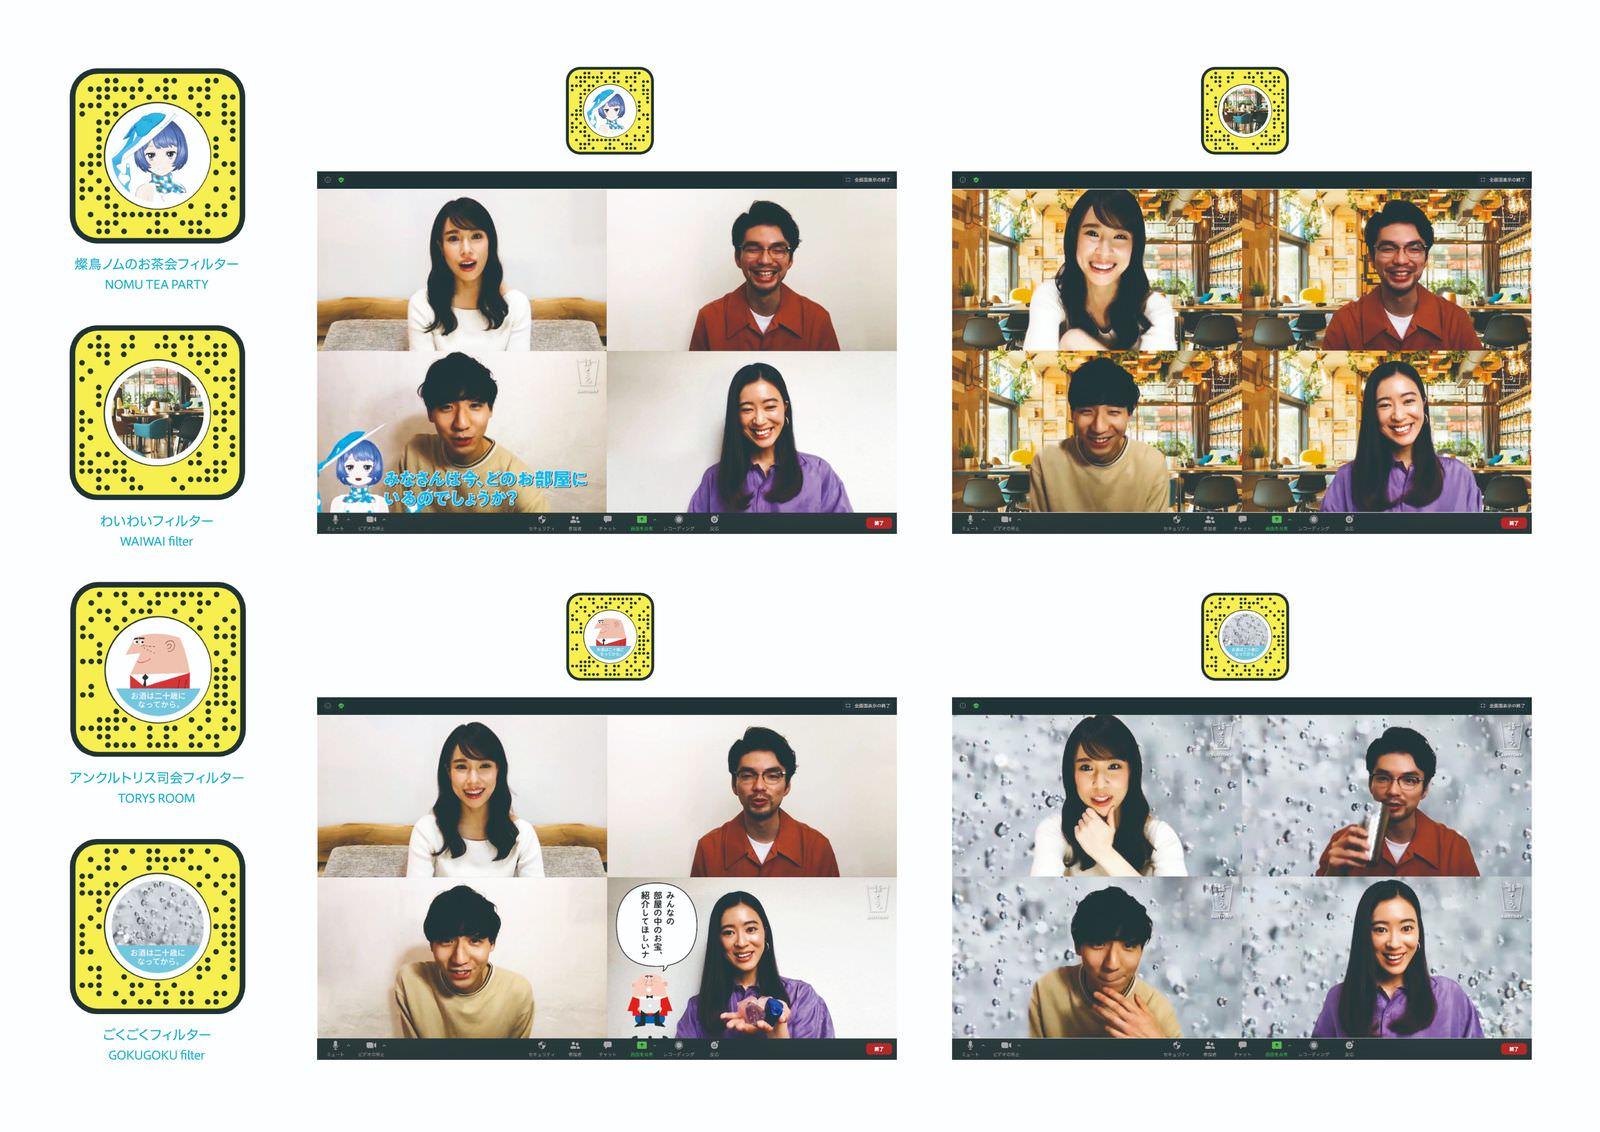 https://dentsulab.tokyo/works/wp-content/uploads/sites/3/2020/09/suntory_hanasou_9.jpeg